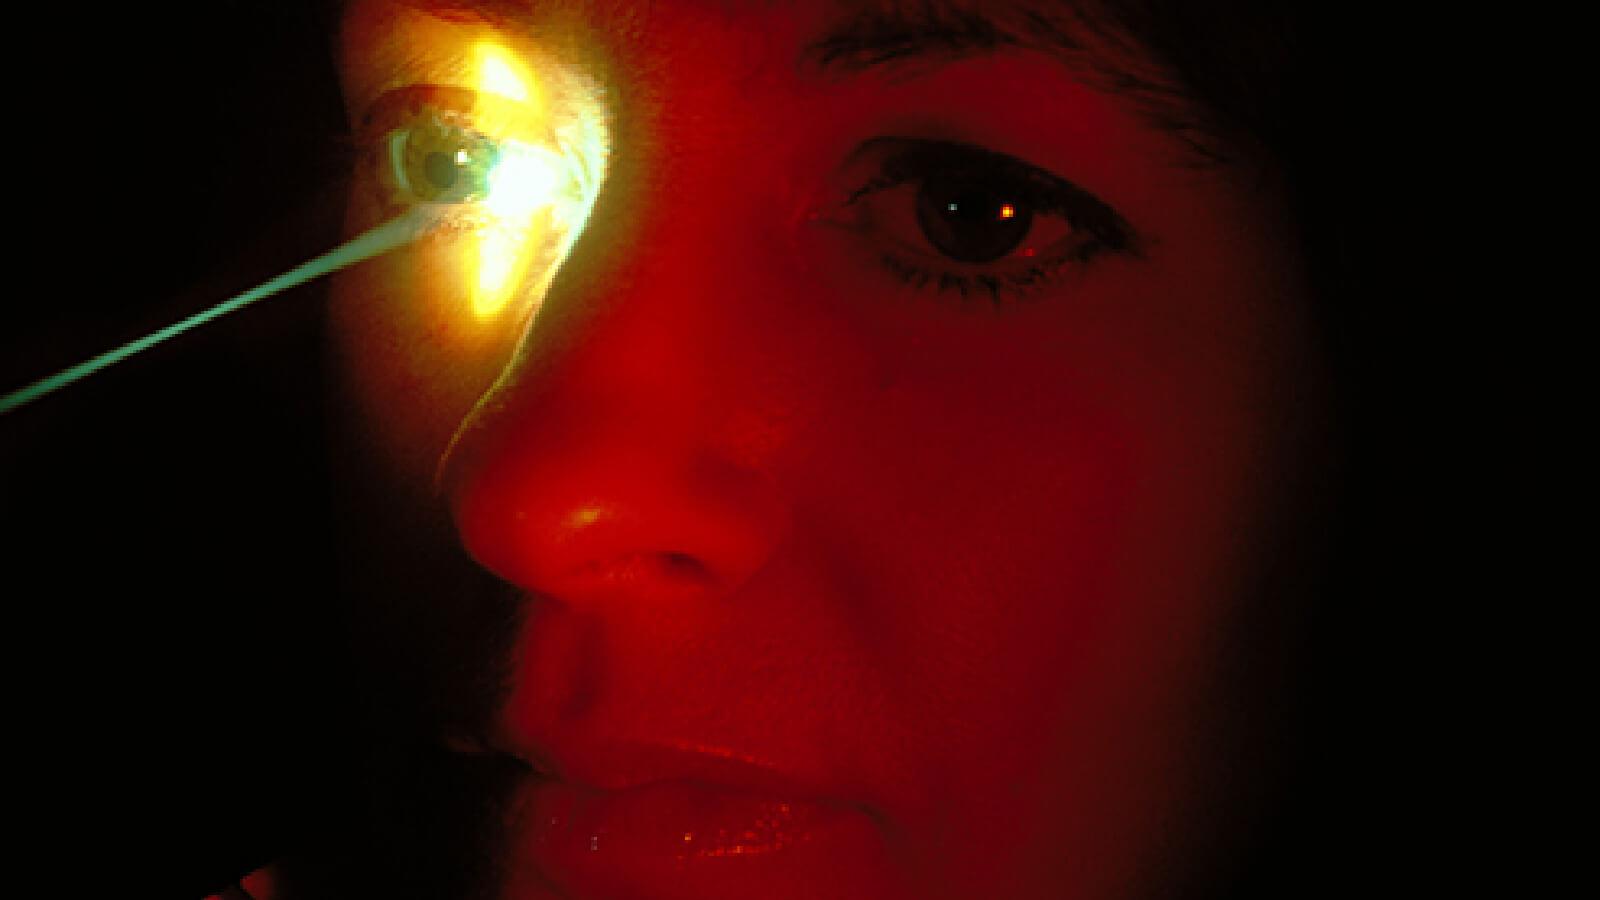 laser procedure for glaucoma